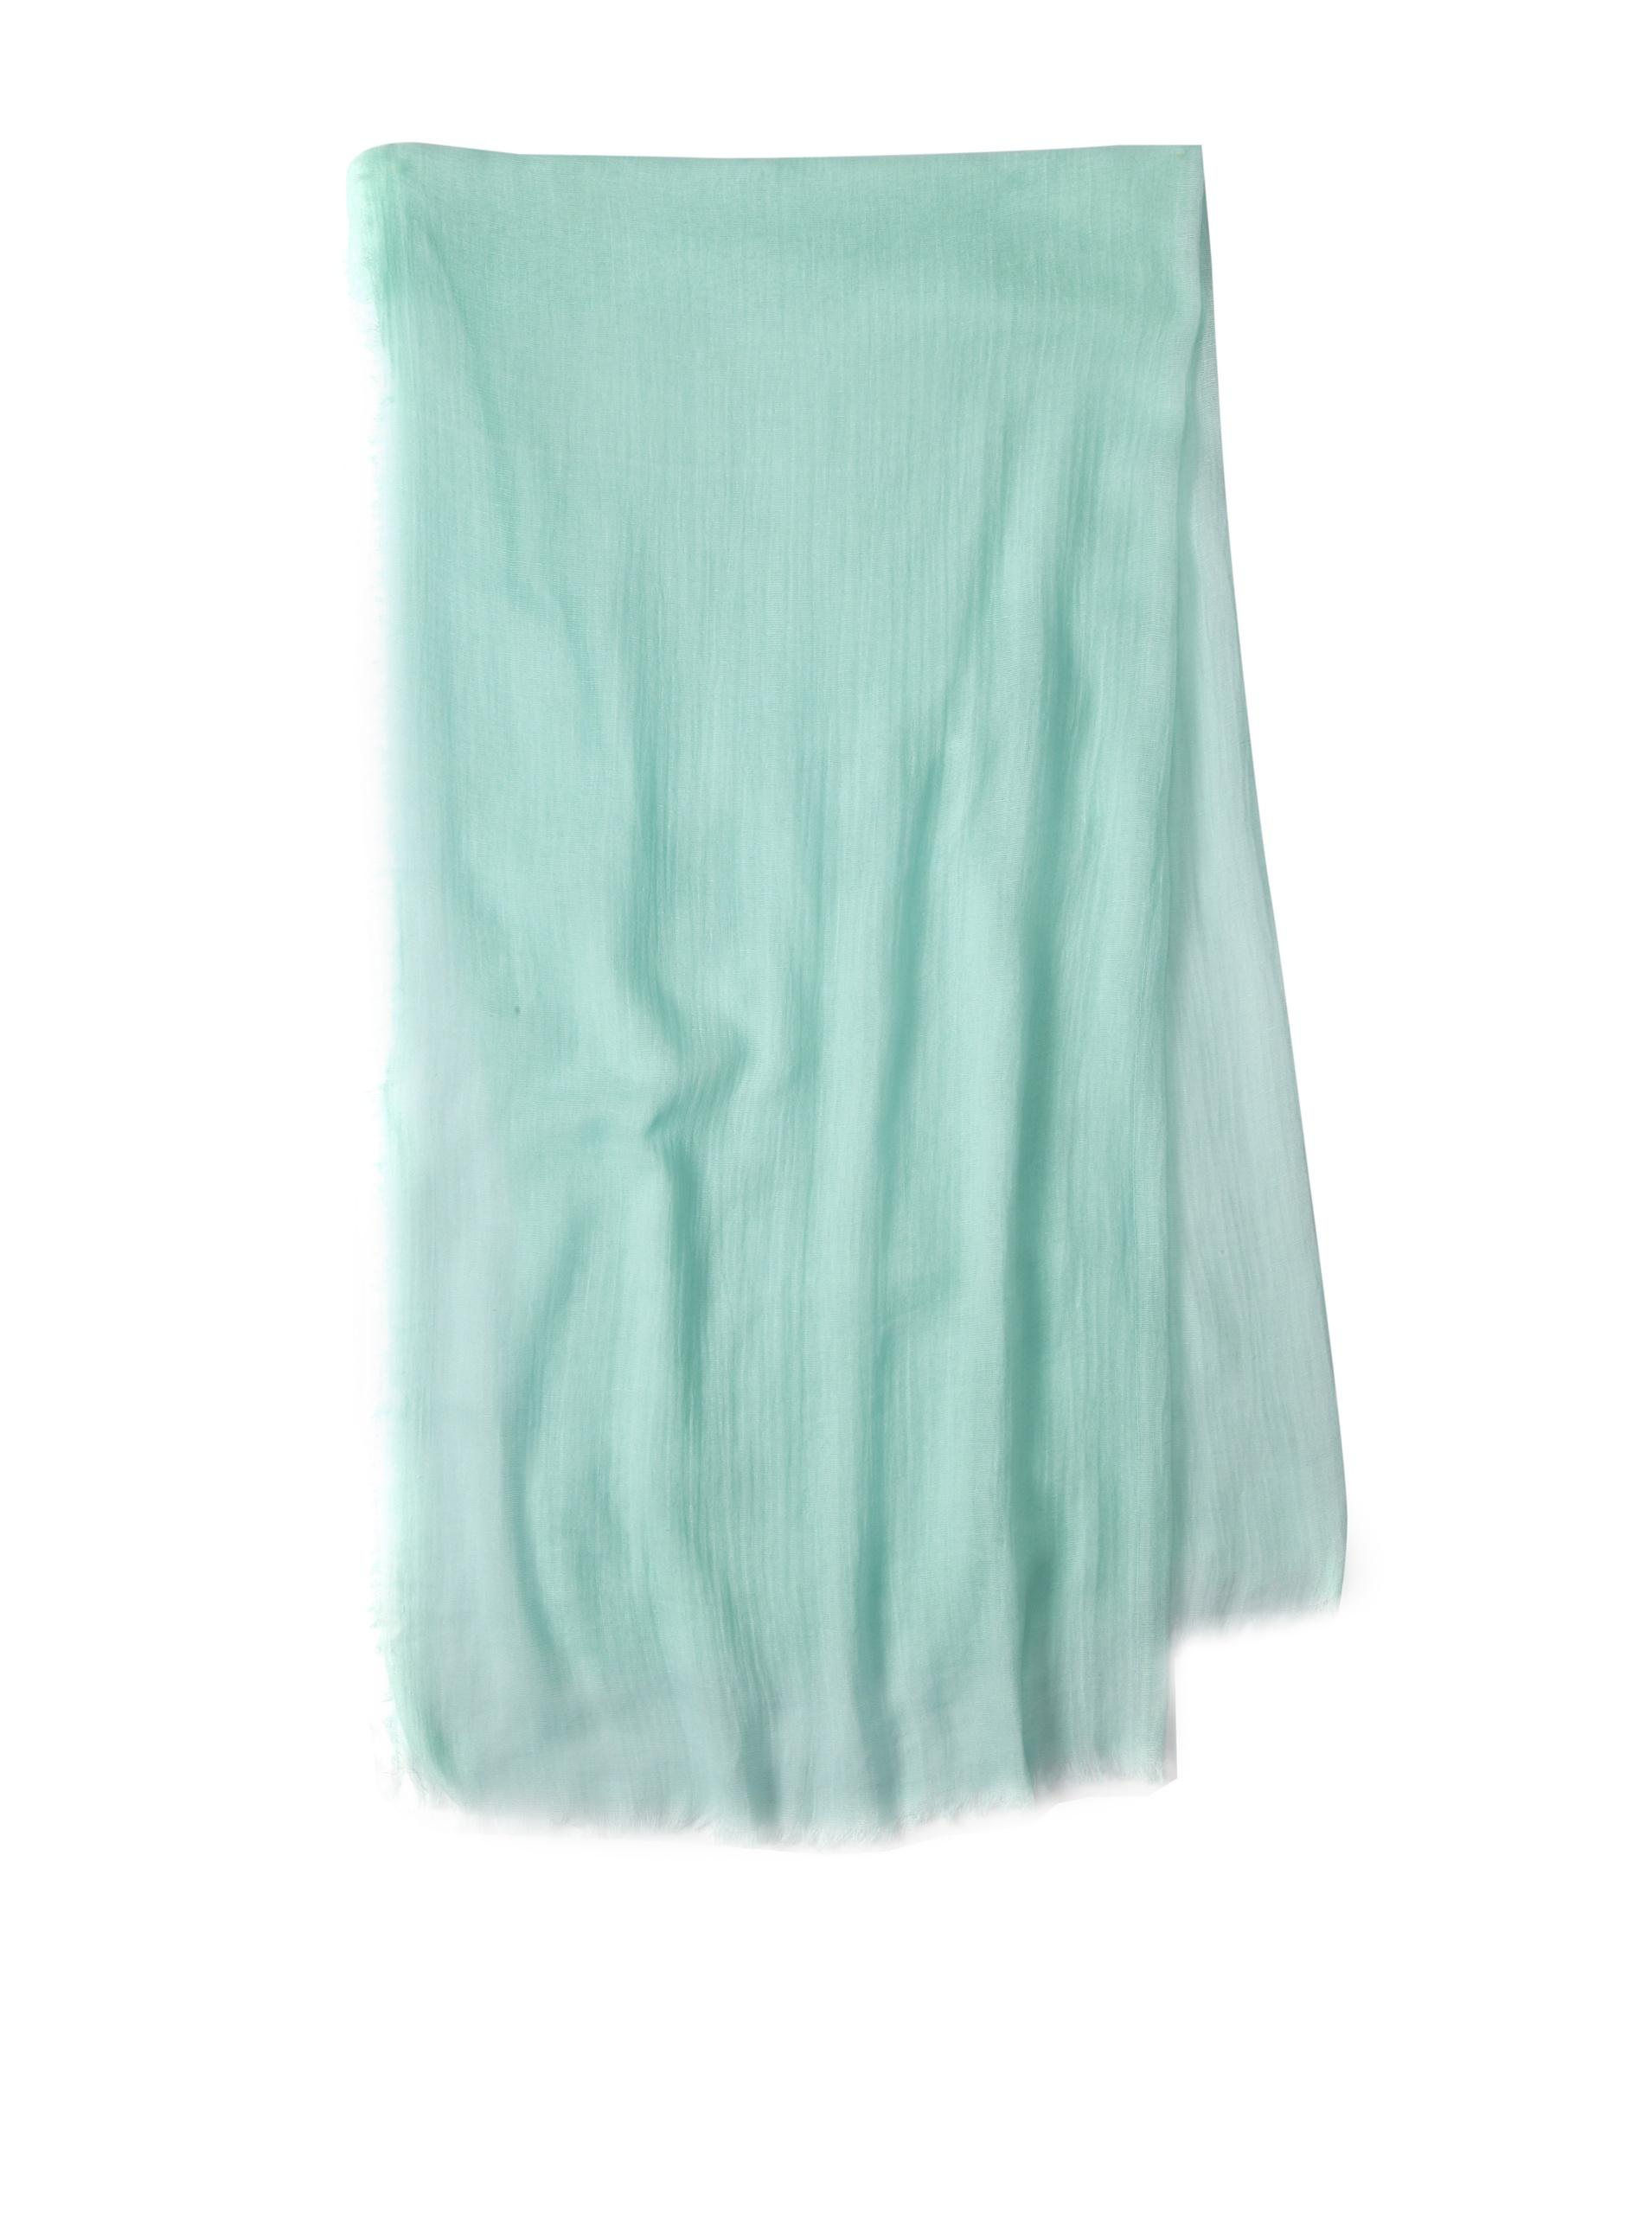 Carolina Amato Women's Cotton Gauze Wrap (Seafoam)